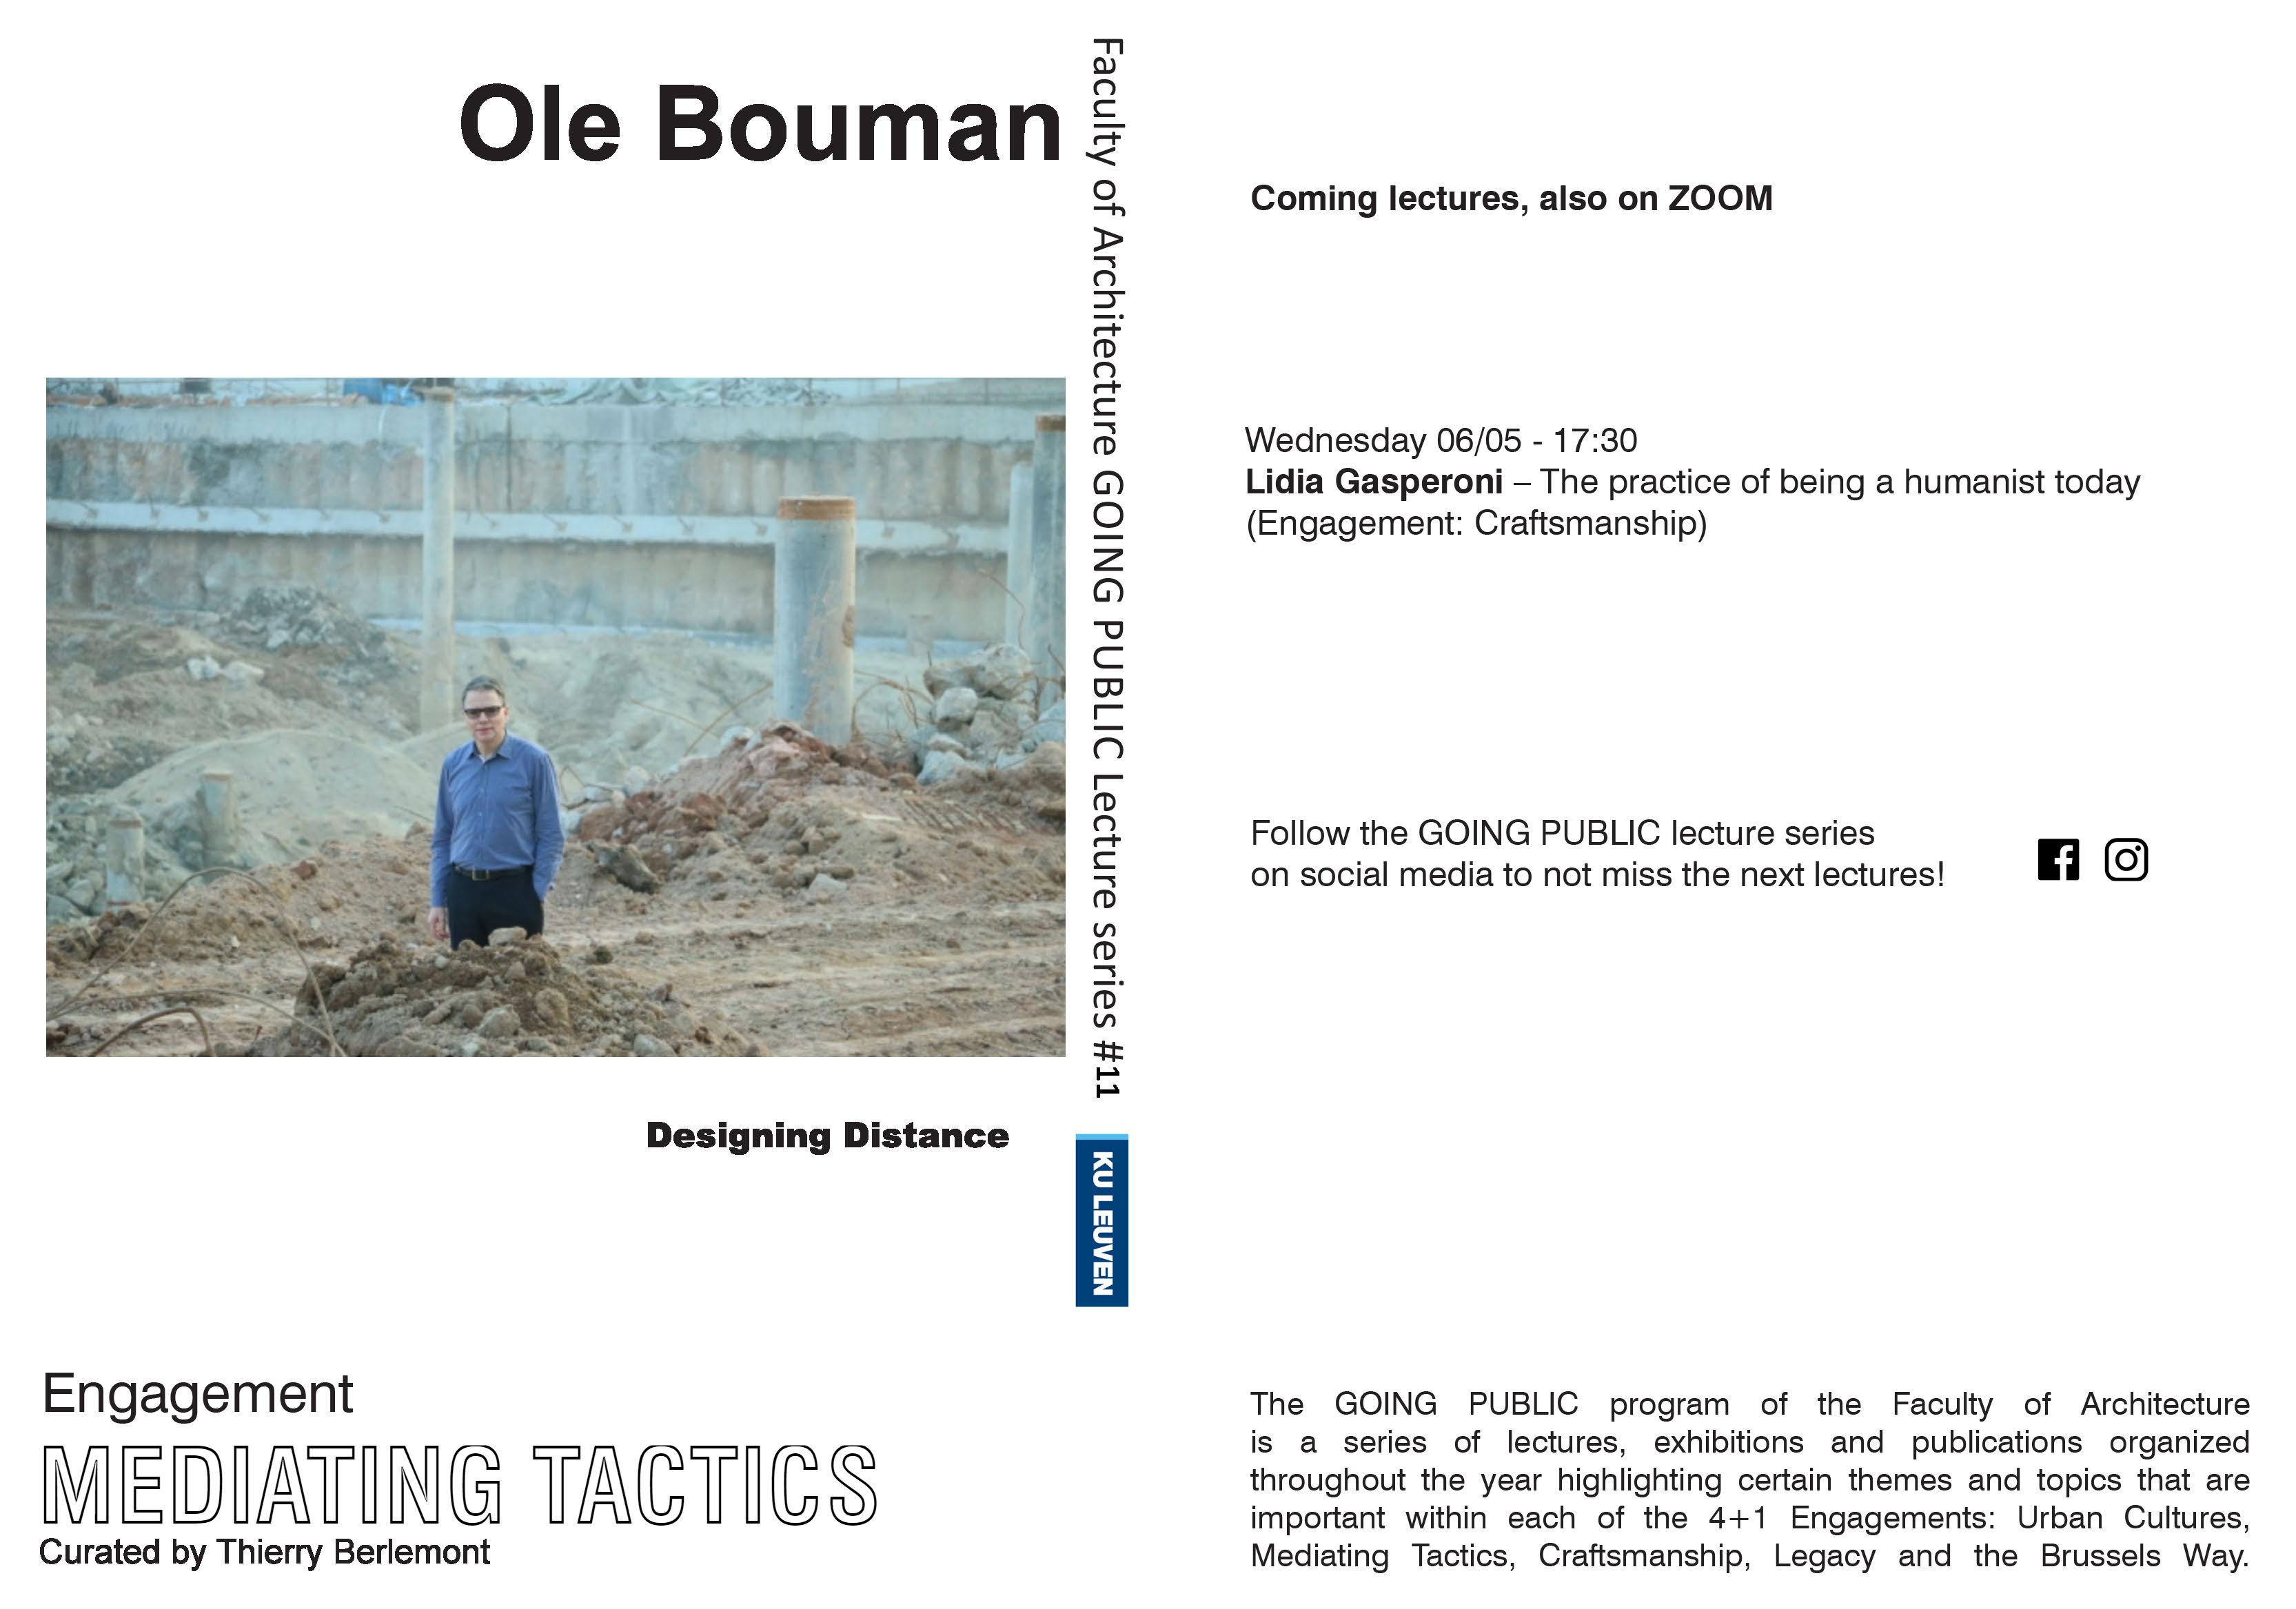 leaflet_ole-bouman_final-1_page_1